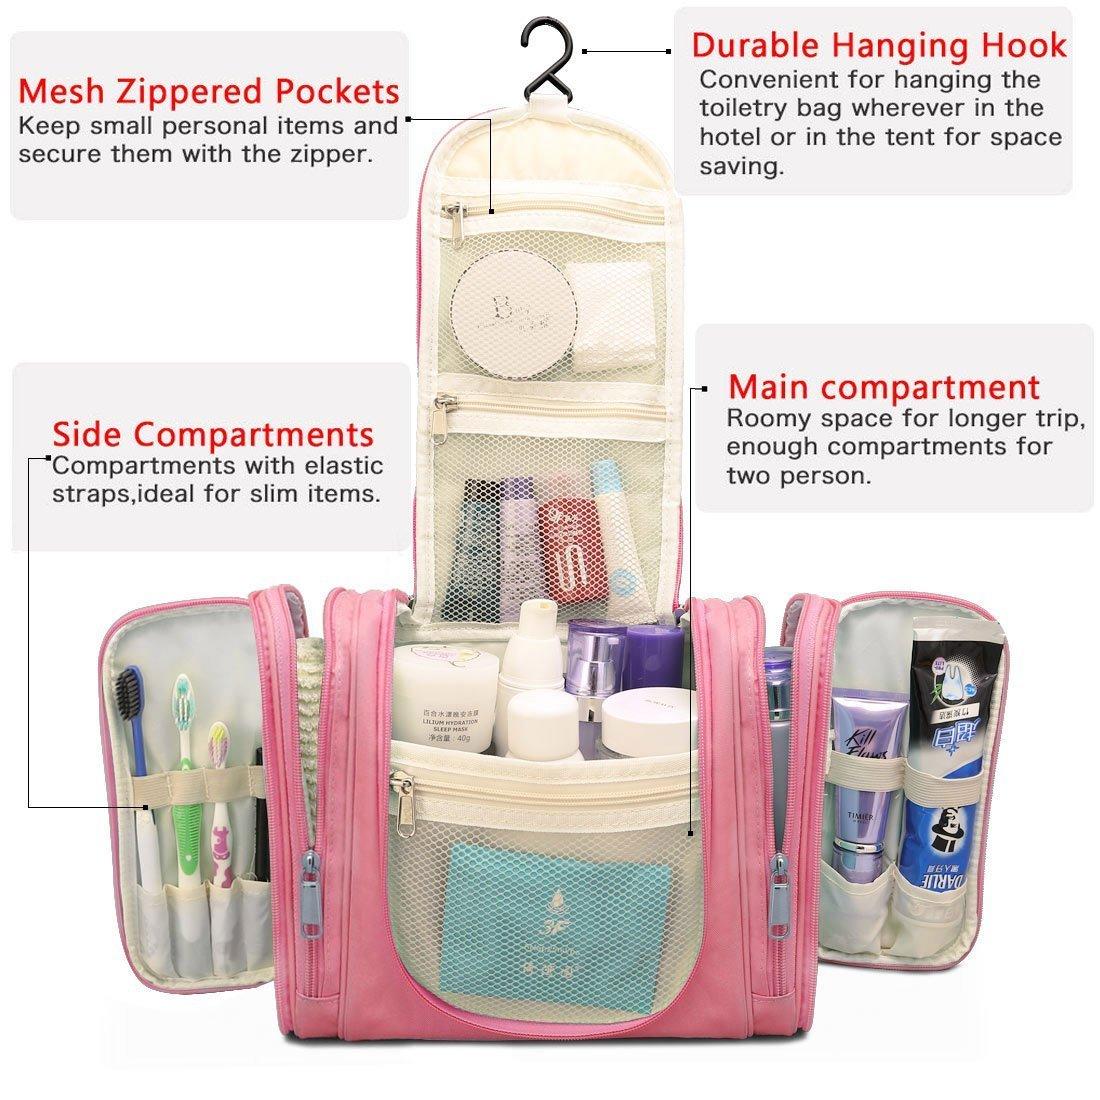 64e634dad1 Hanging Toiletry Bag Portable Travel Camping Organizer Waterproof Cosmetic  Makeup Shaving Bag Toiletry Kit for Men